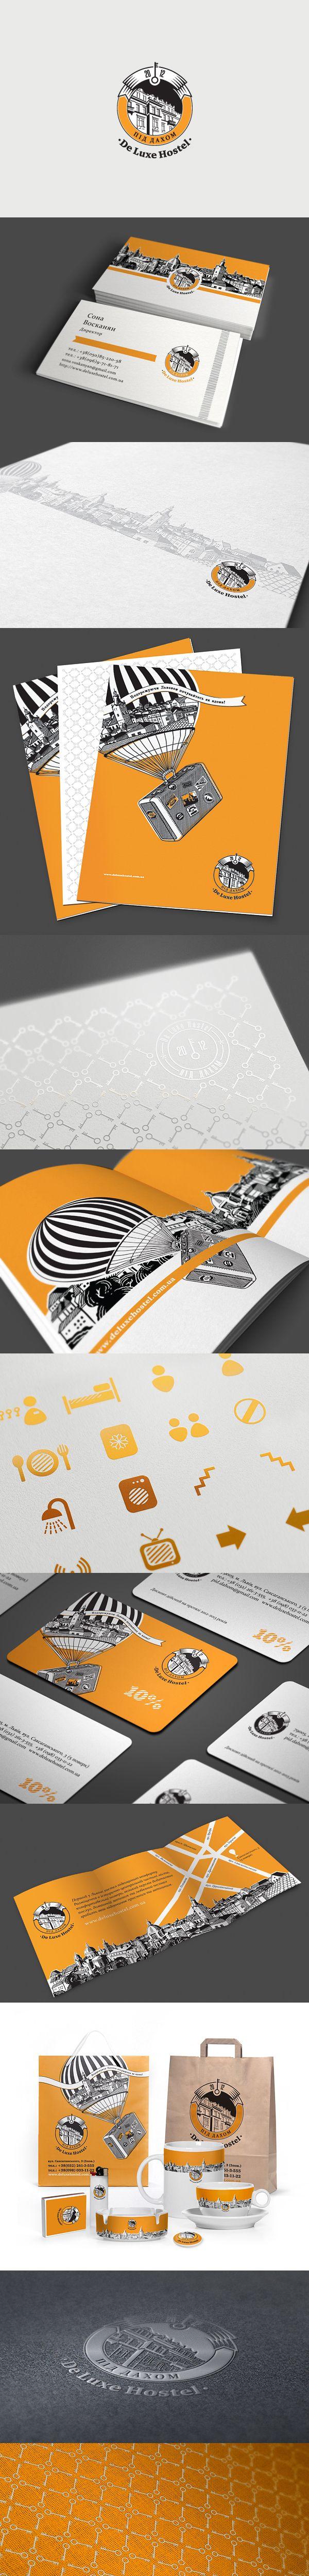 Hostel #packaging #branding #marketing PD